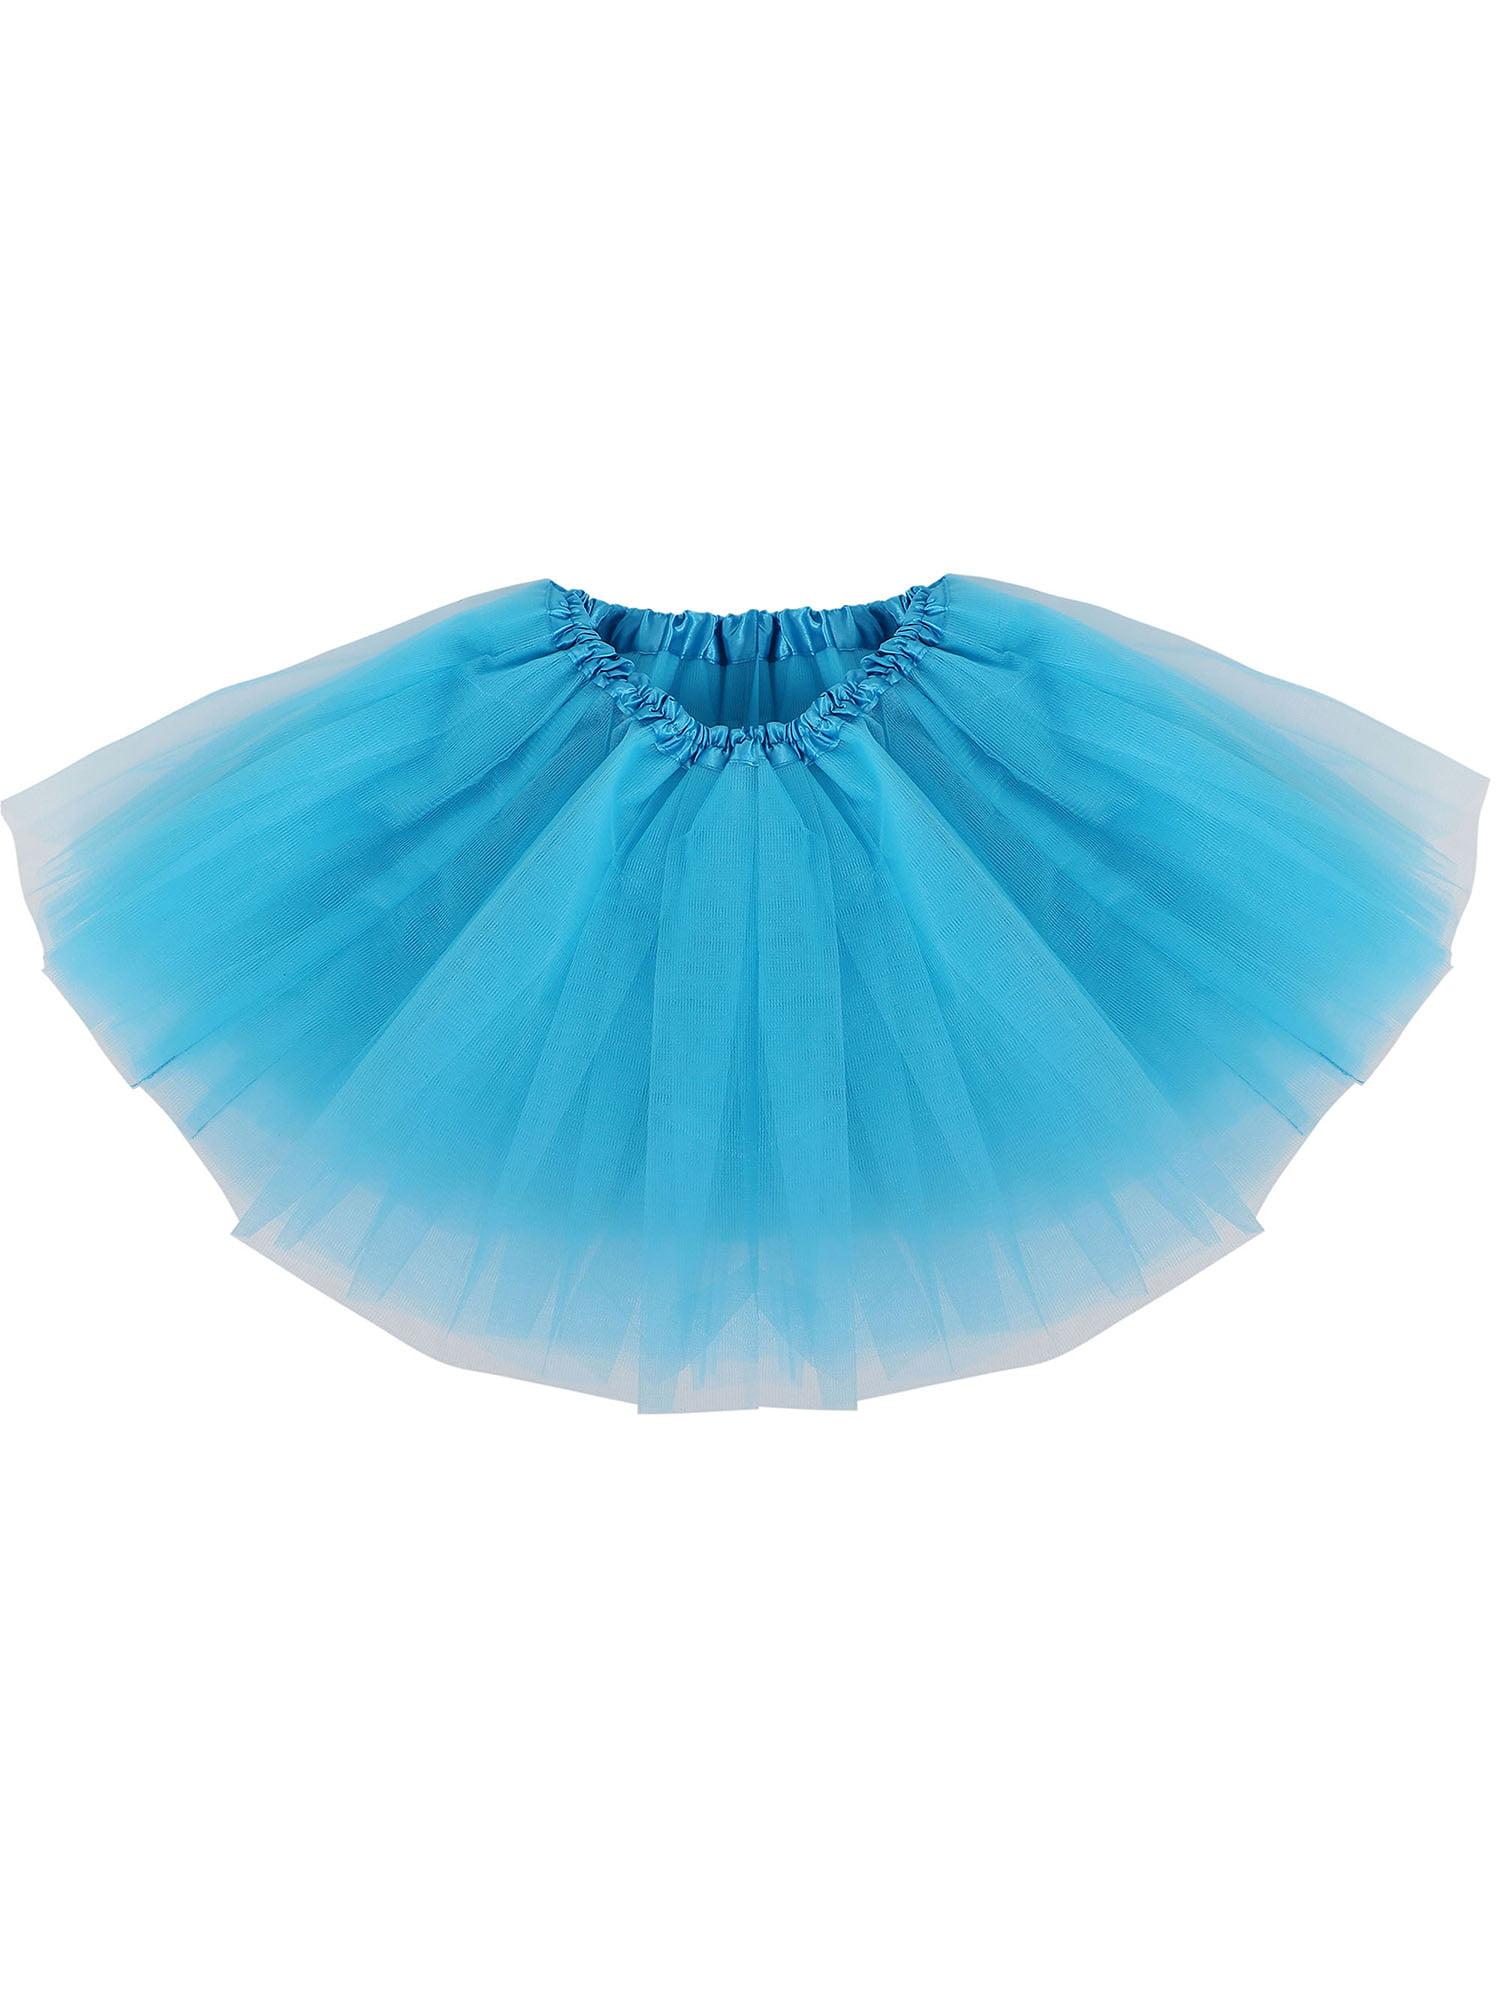 Simplicity Baby Classic Elastic 5 Layer Tulle Tutu Skirt Pettiskirt,Peacock Blue